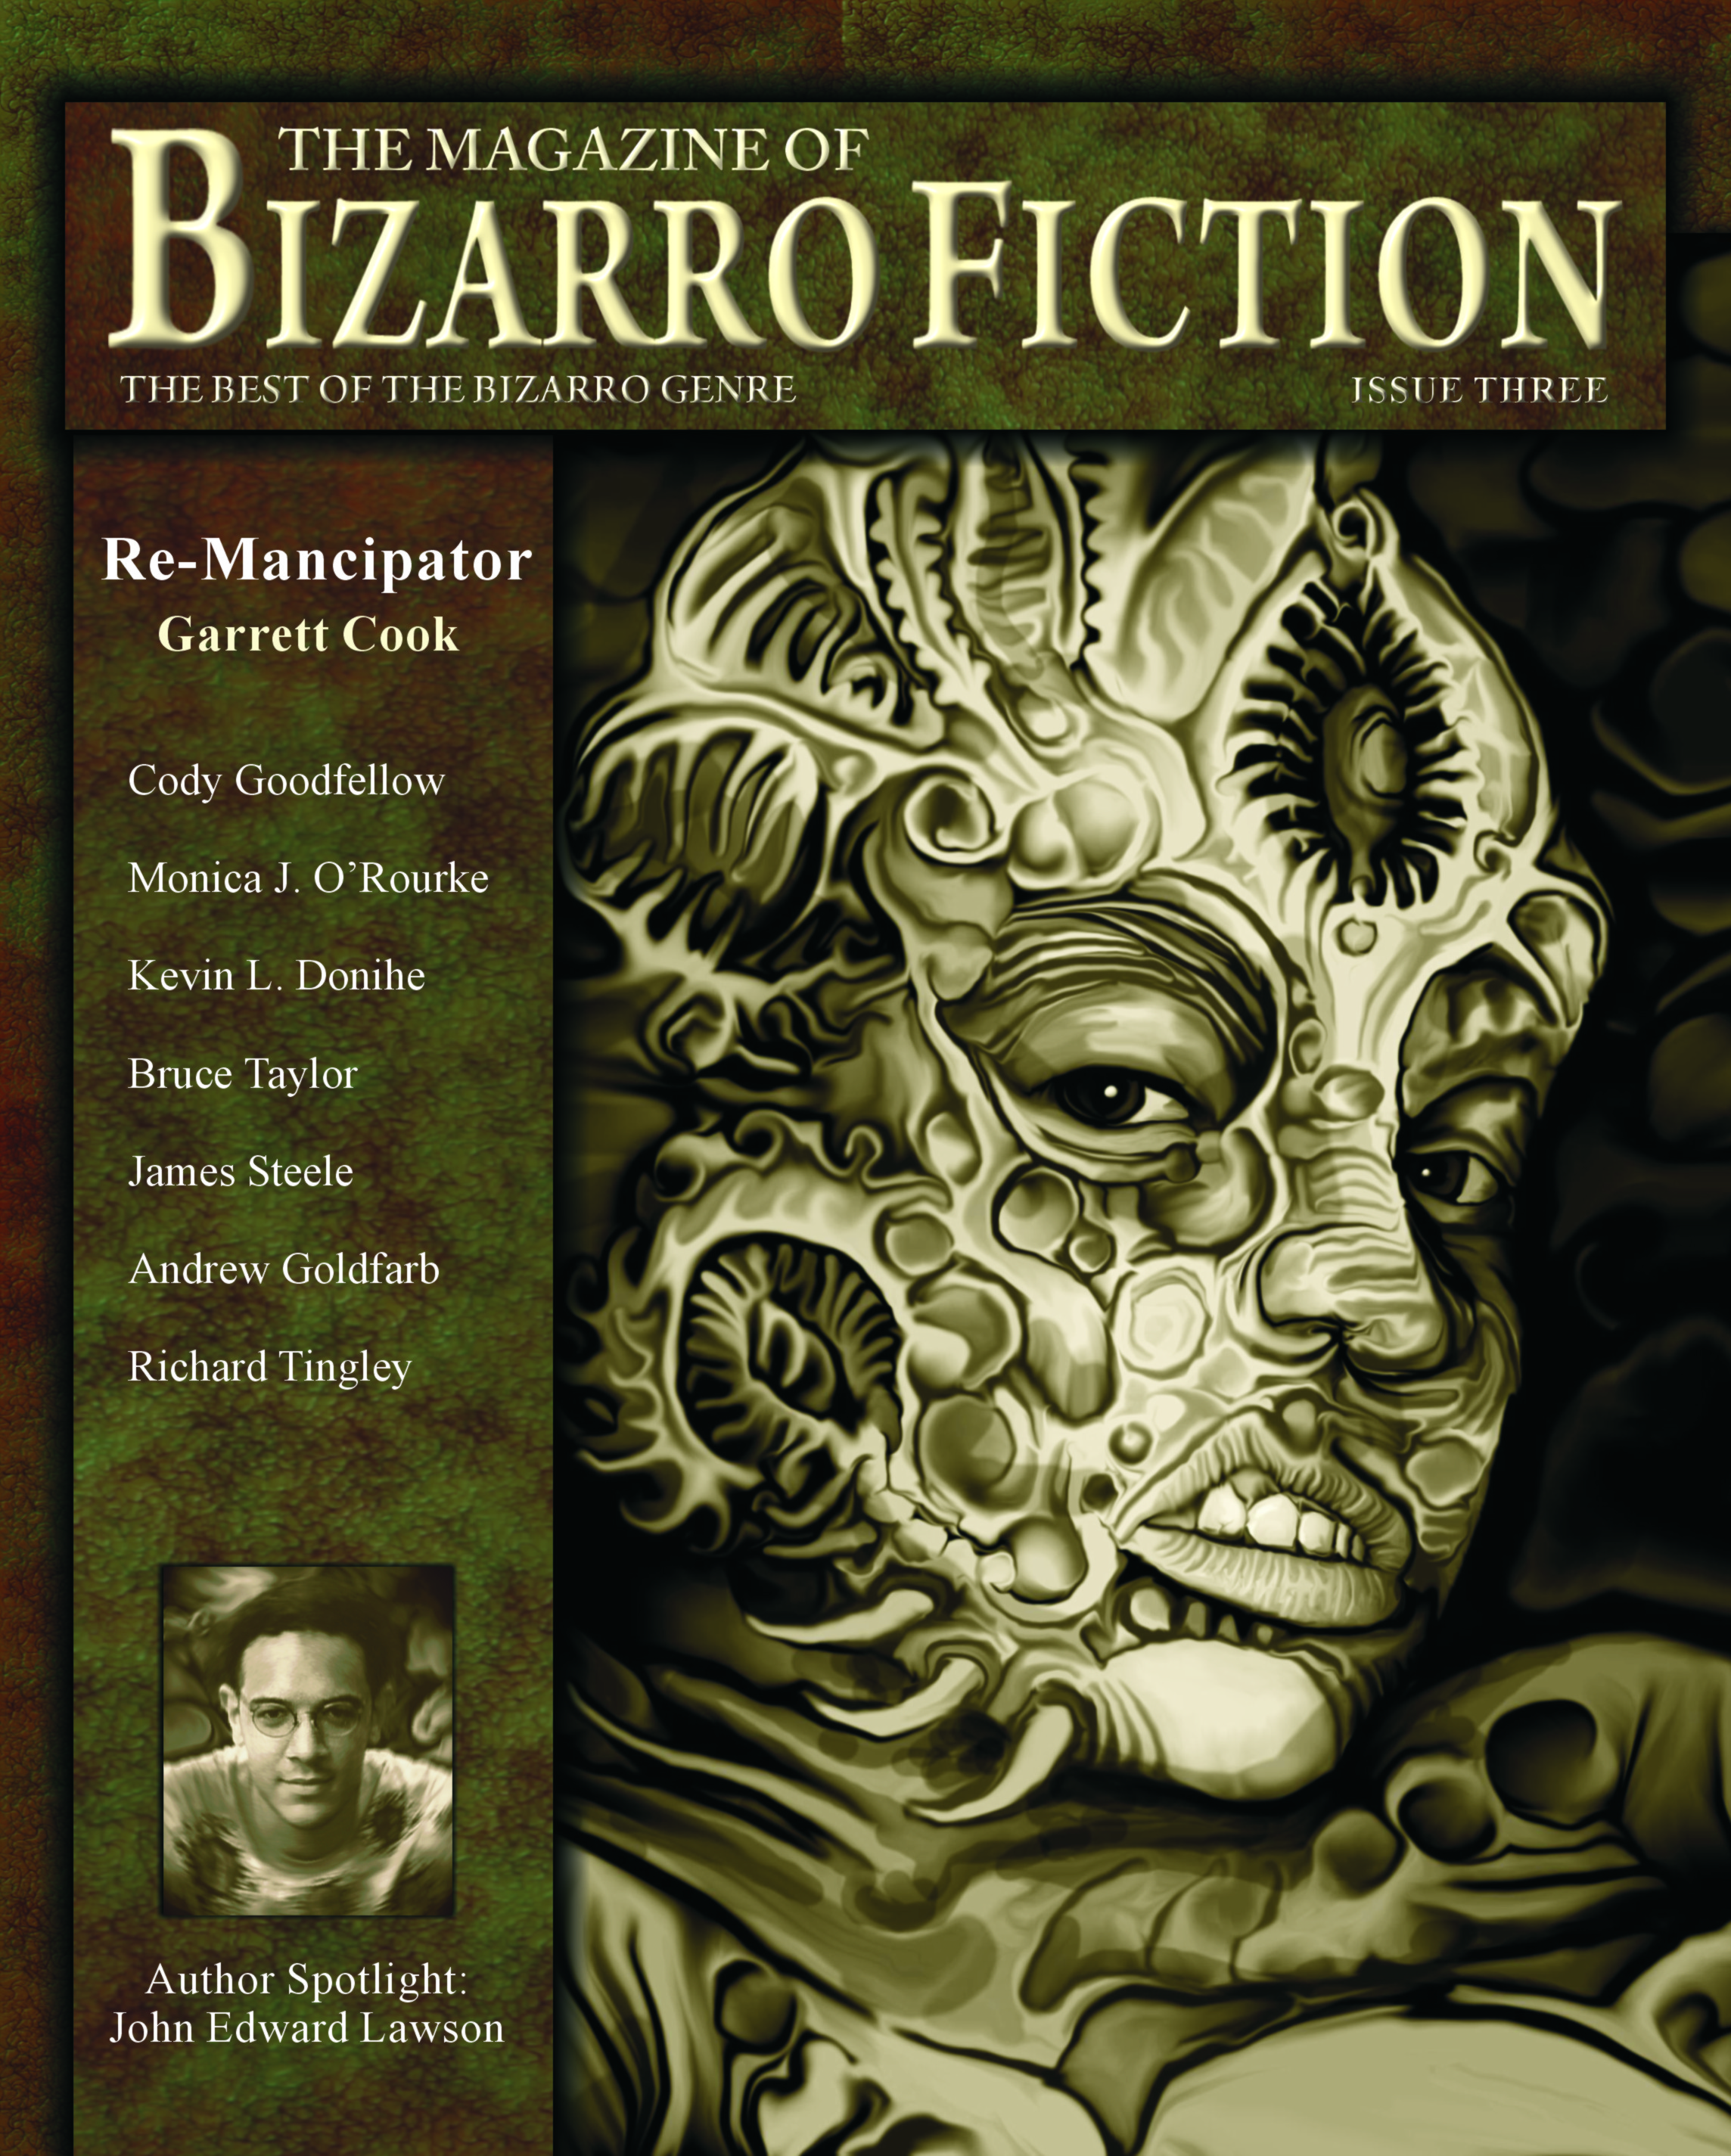 The Magazine Of Bizarro Fiction #3